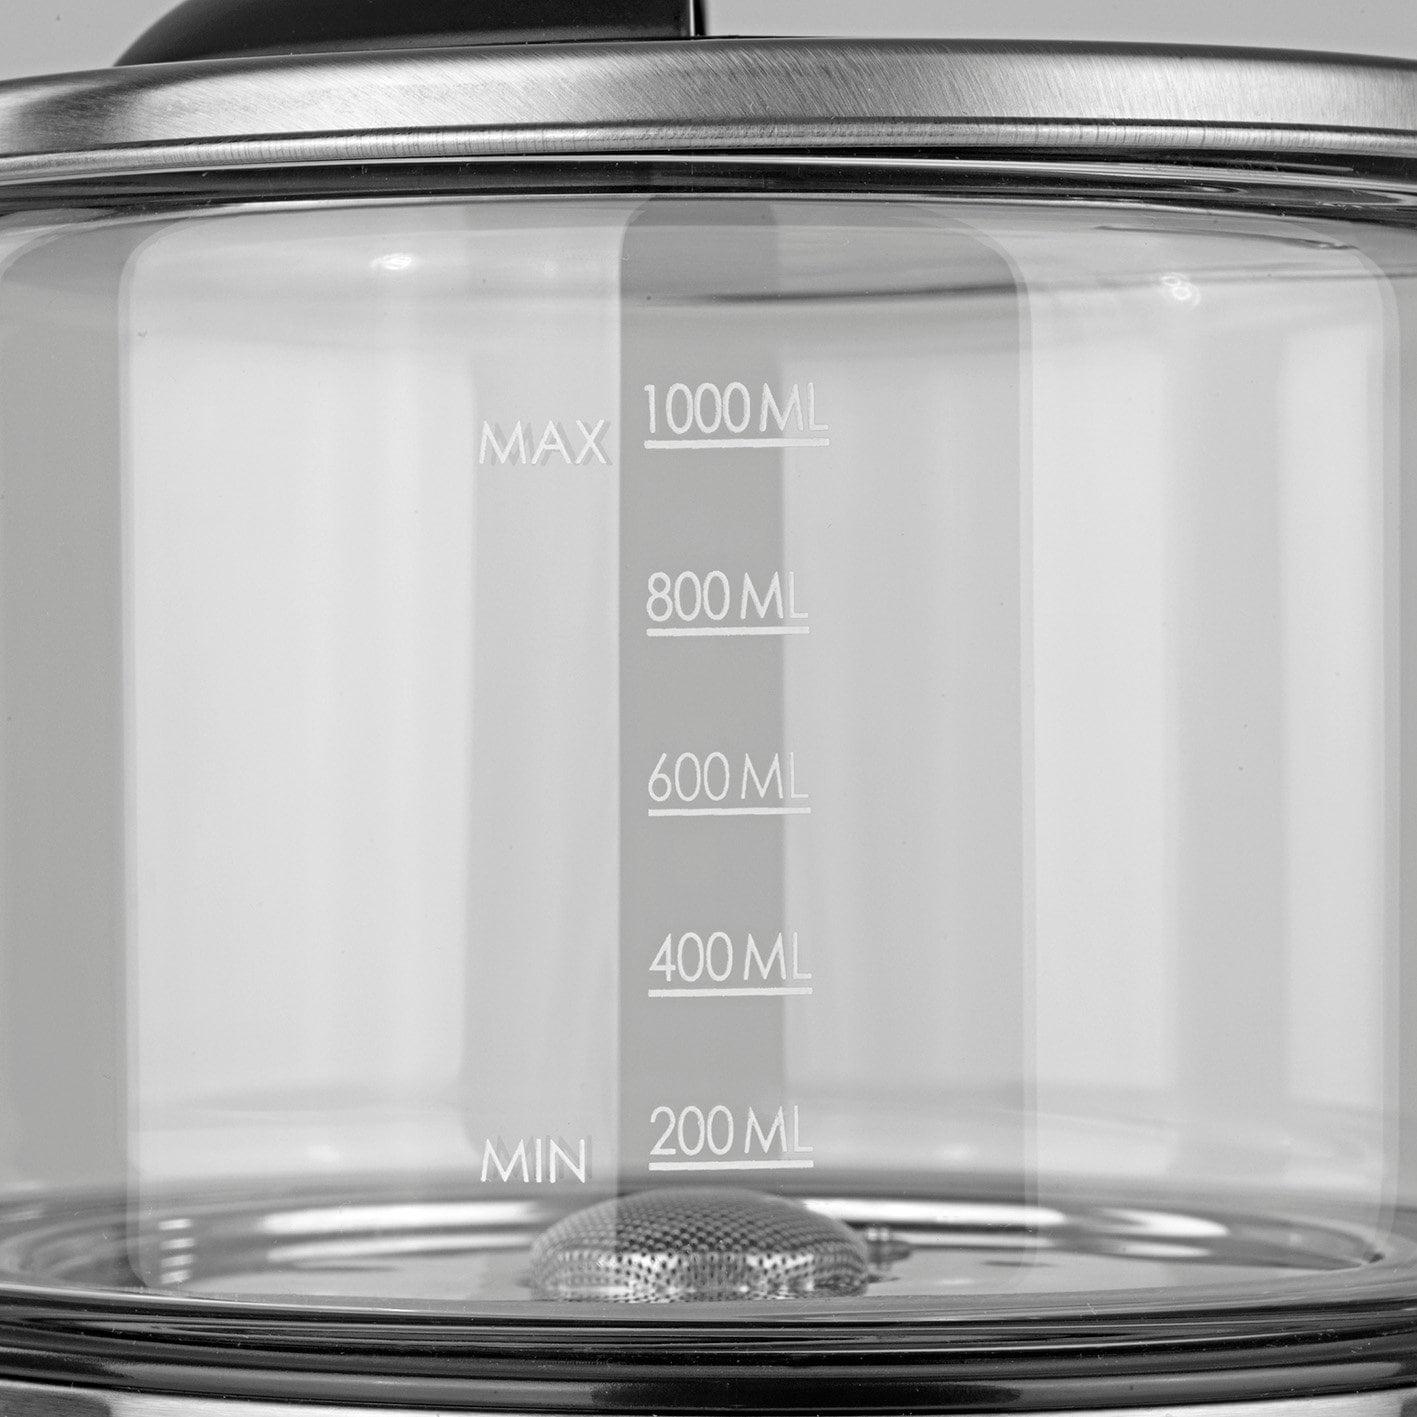 BEEM POUR OVER Filterkaffeemaschine mit Waage - Glas - Edelstahl